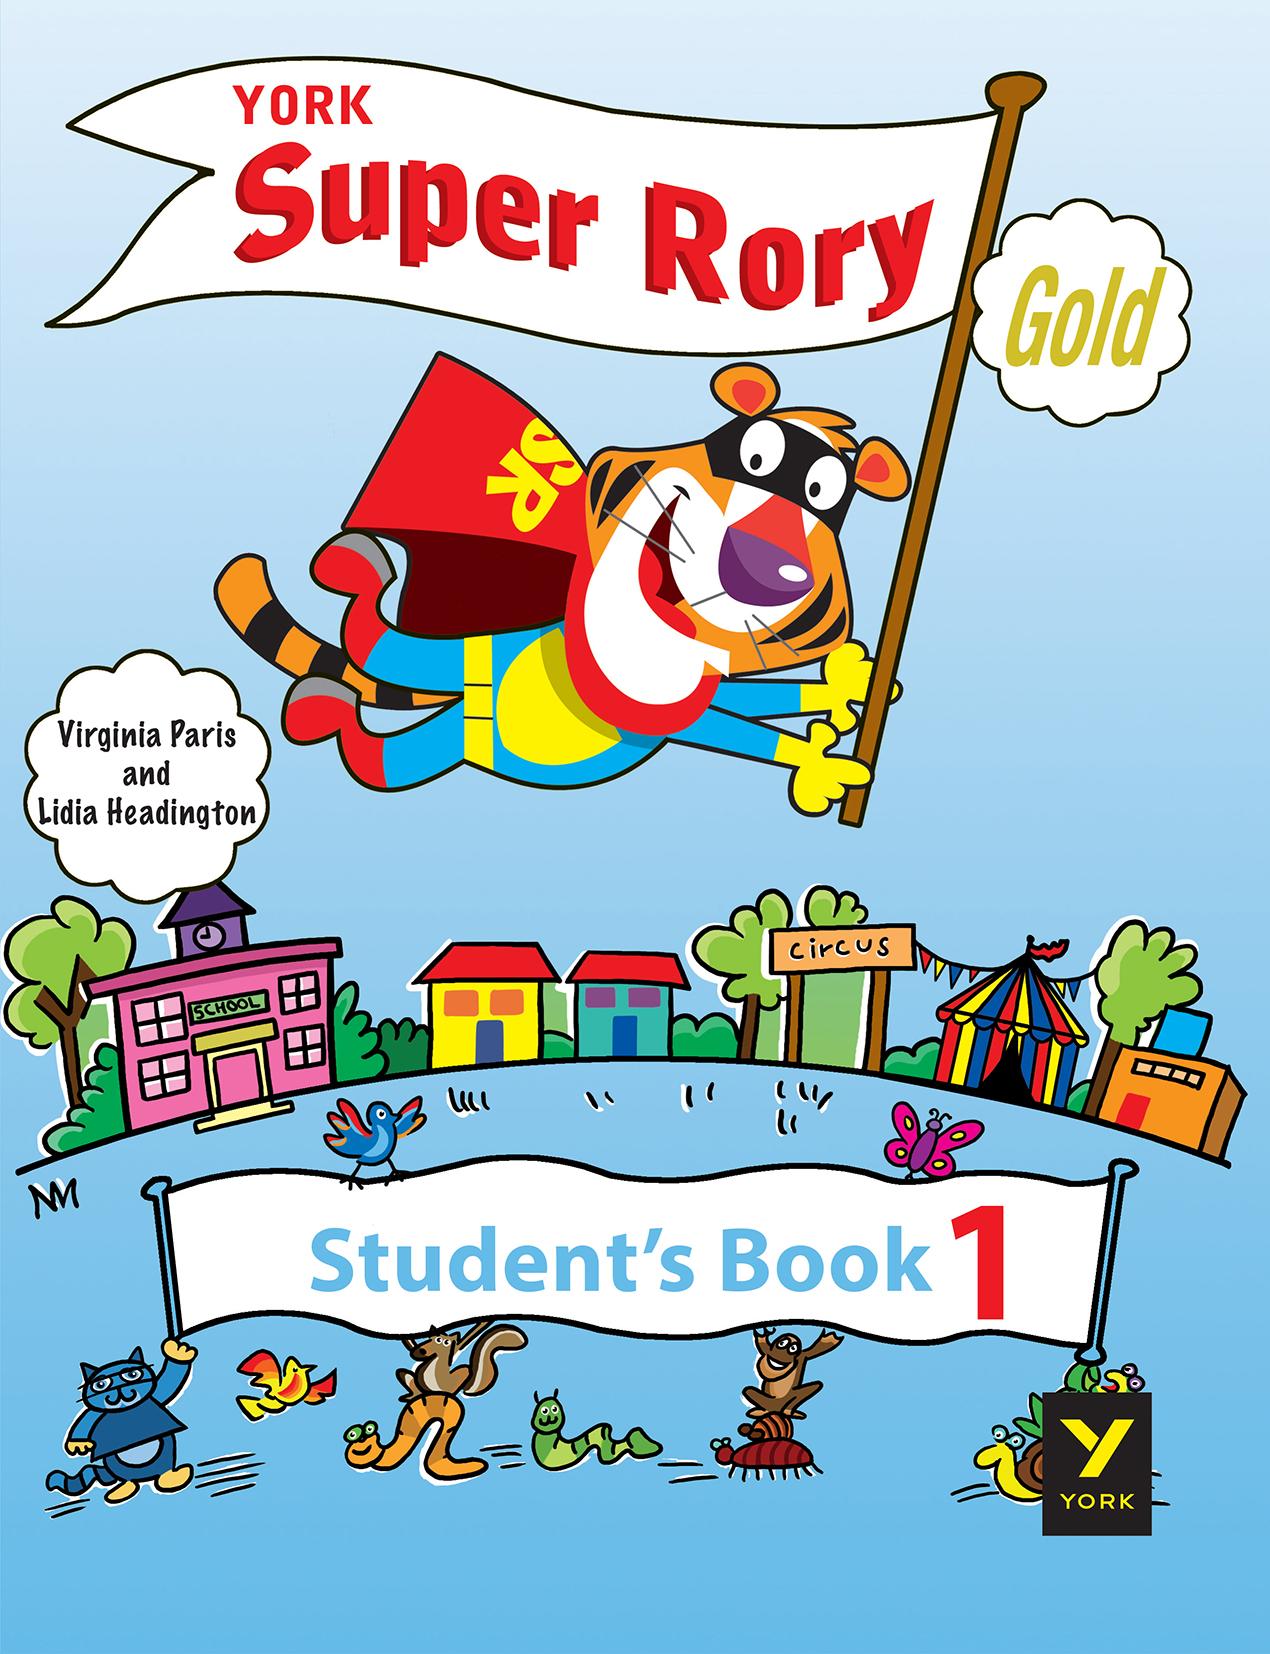 York Super Rory Gold